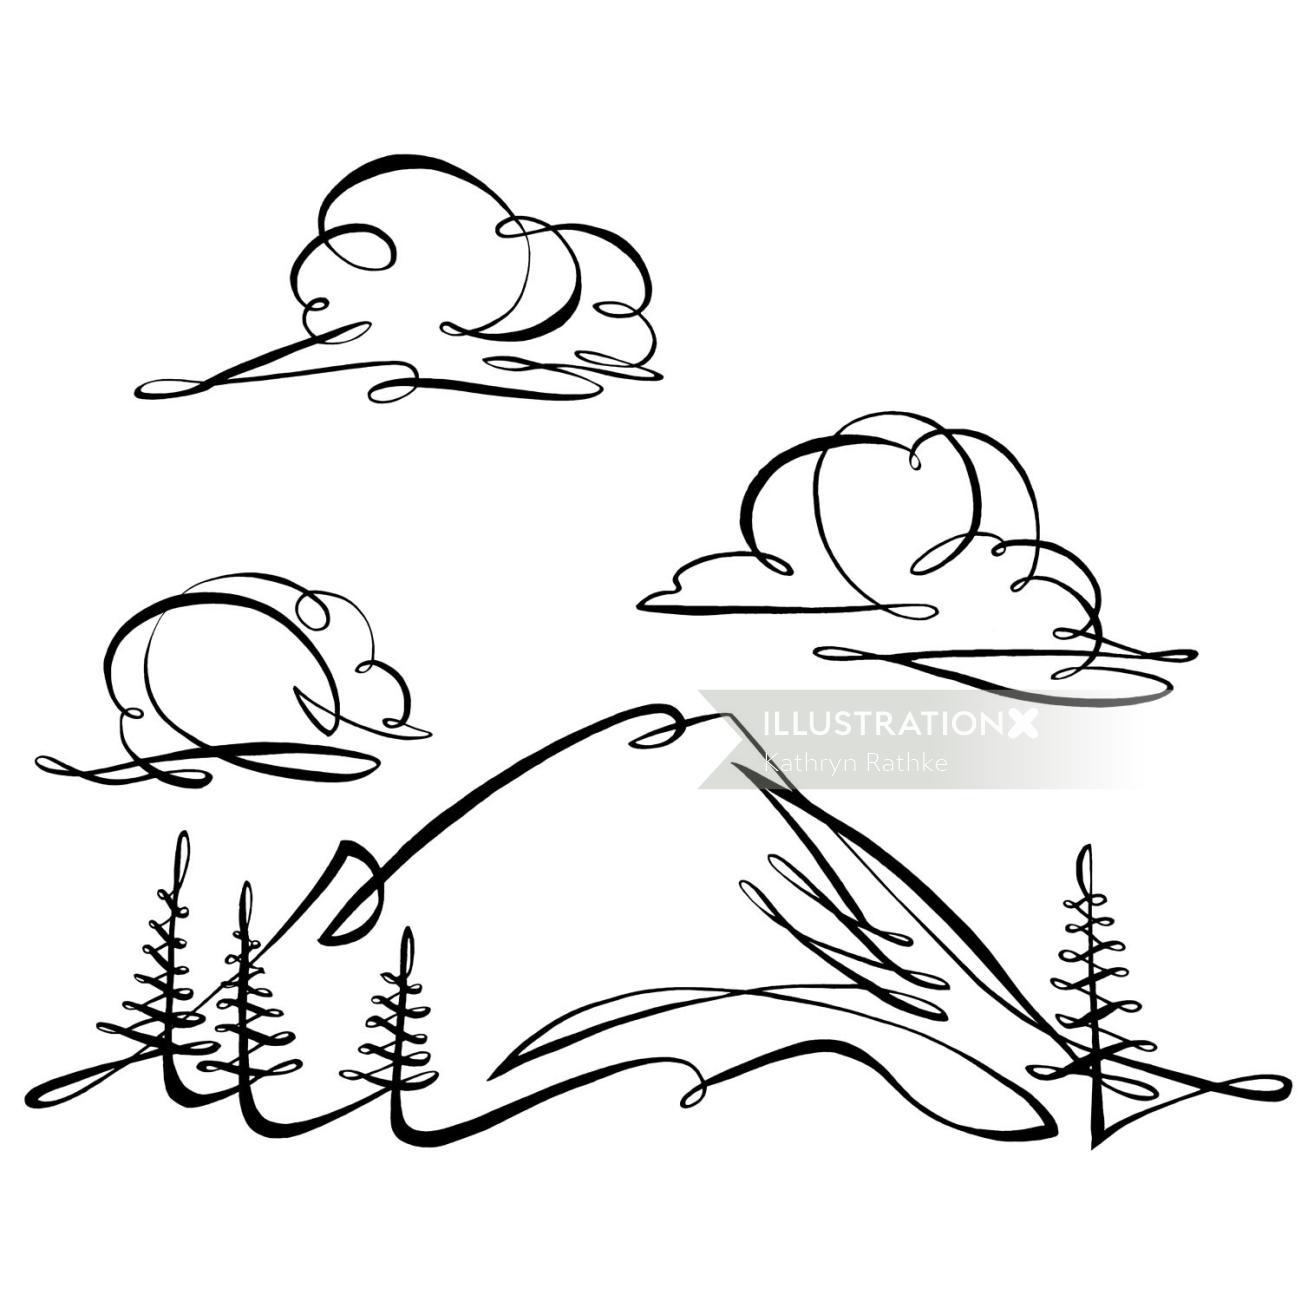 Line illustration of Evergreen State Bank card image